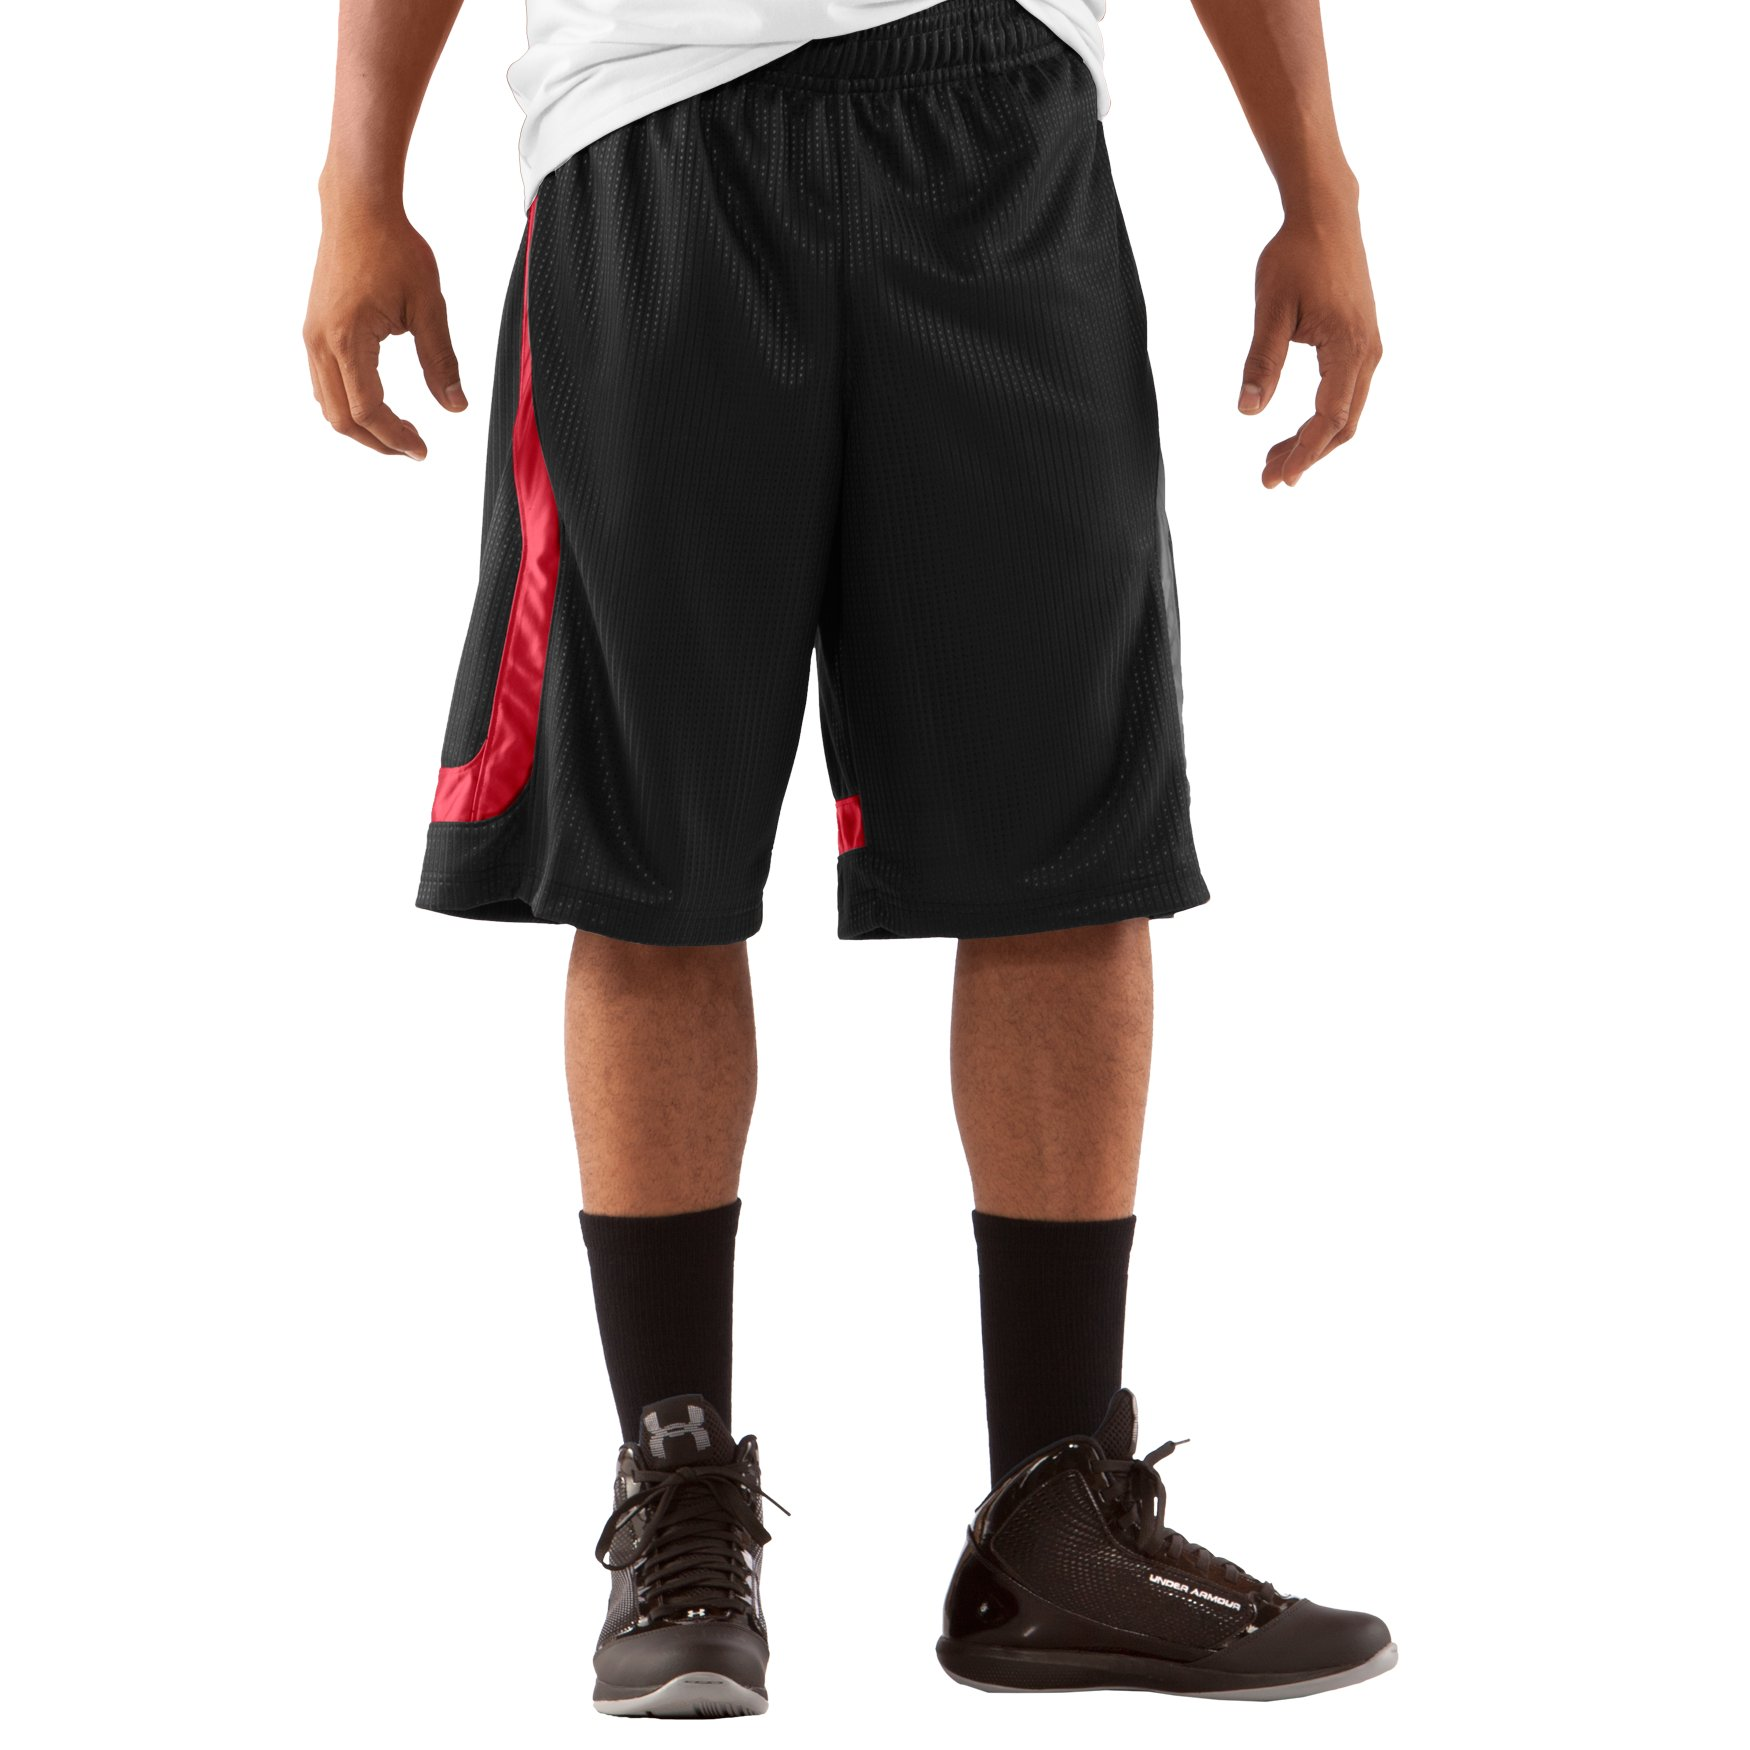 "brad Asks About Men's UA Regent 12"" Basketball Shorts - Needle"